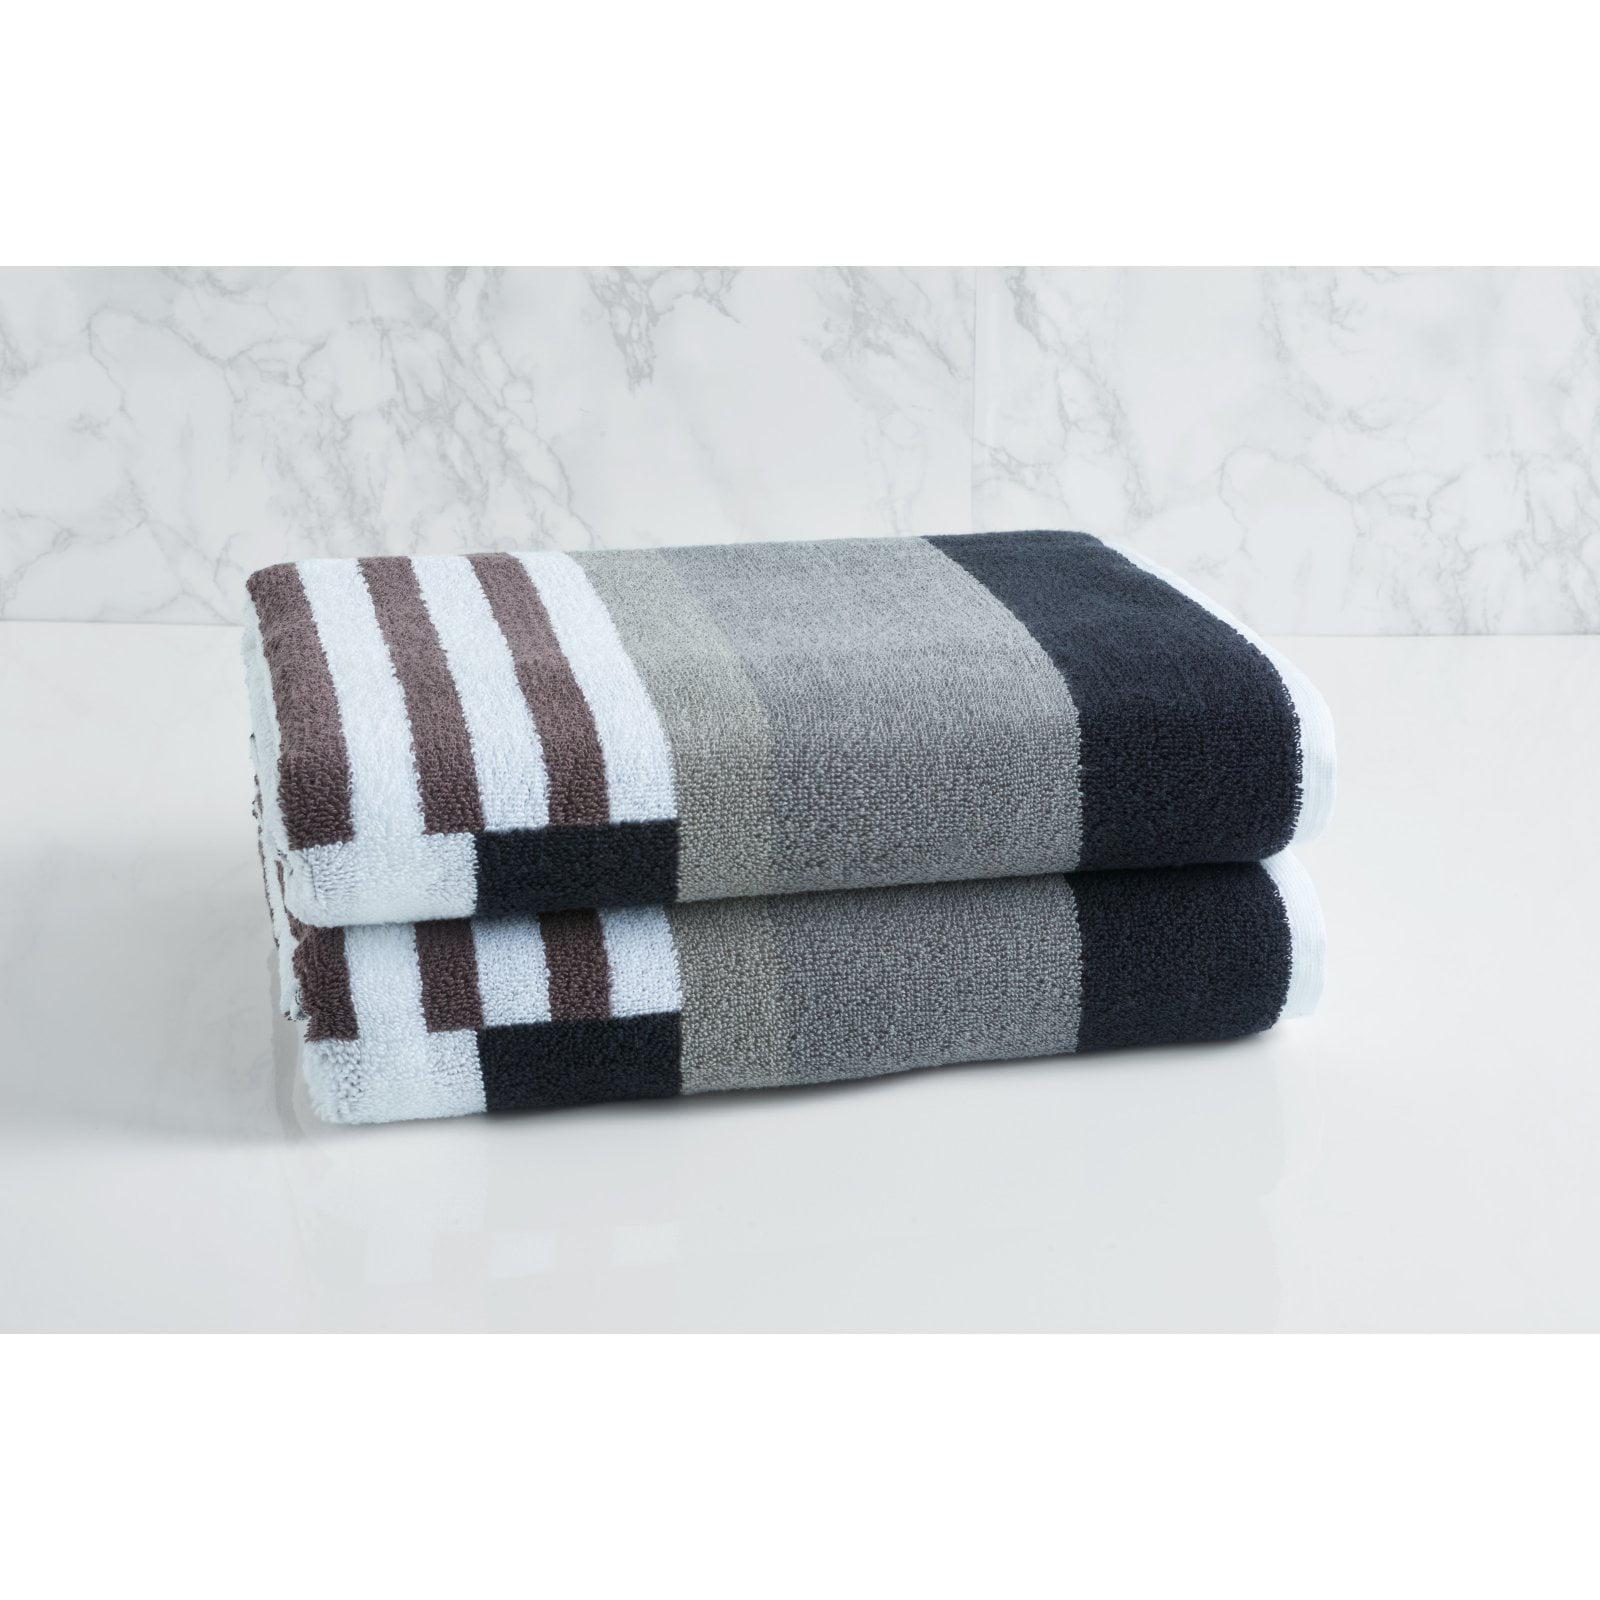 LOFT by Loftex Trestle Cotton Bath Towel by Loftex Home LLC